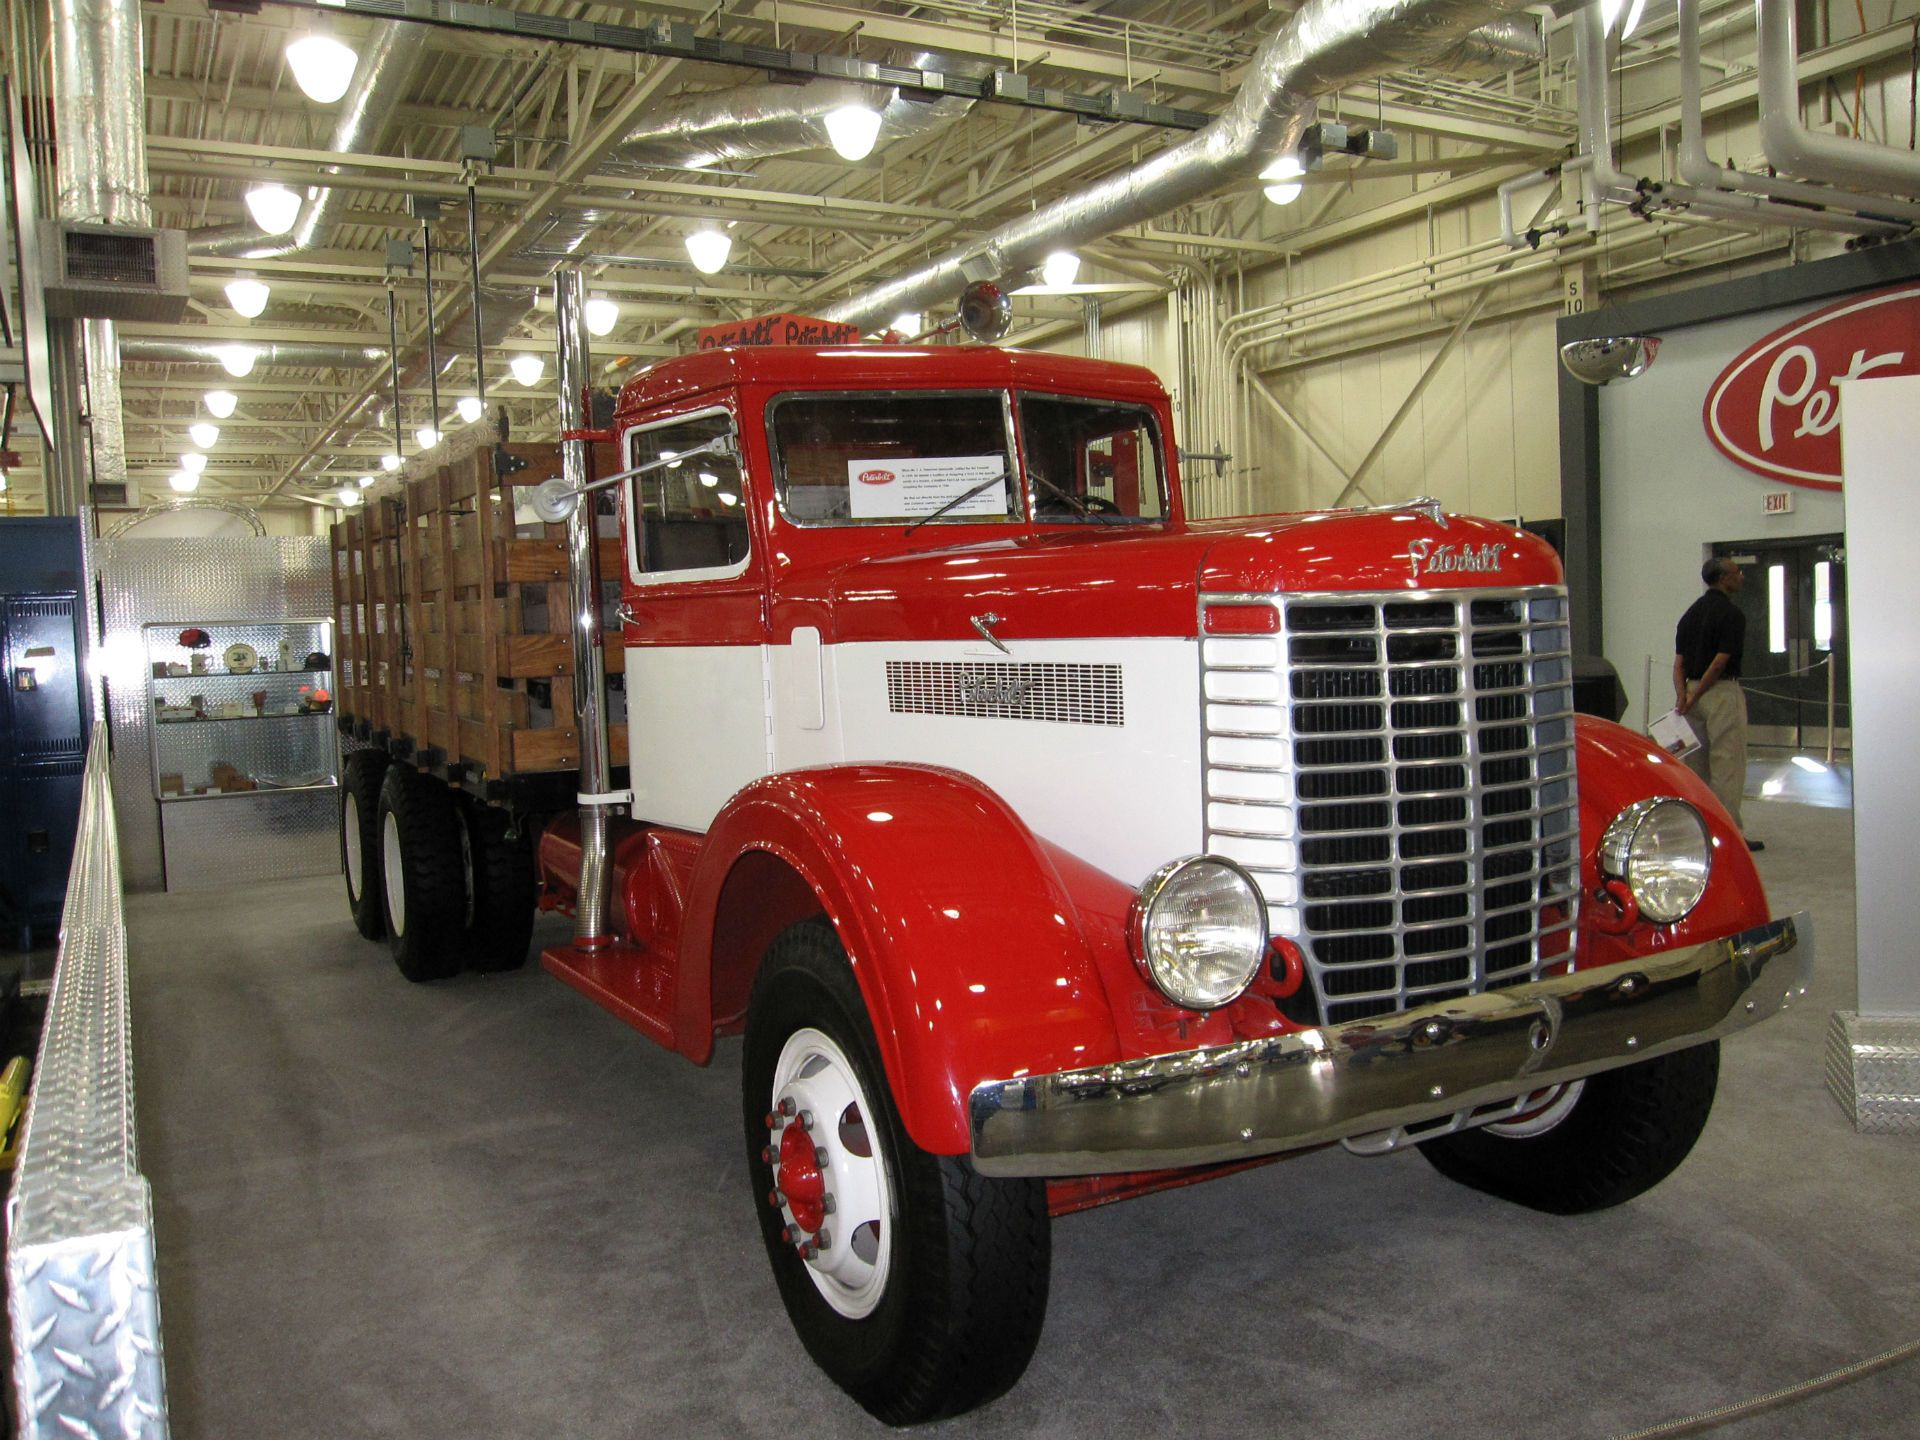 AHL-Hartoy 1/64 Scale Truck Prototypes on Pinterest ...